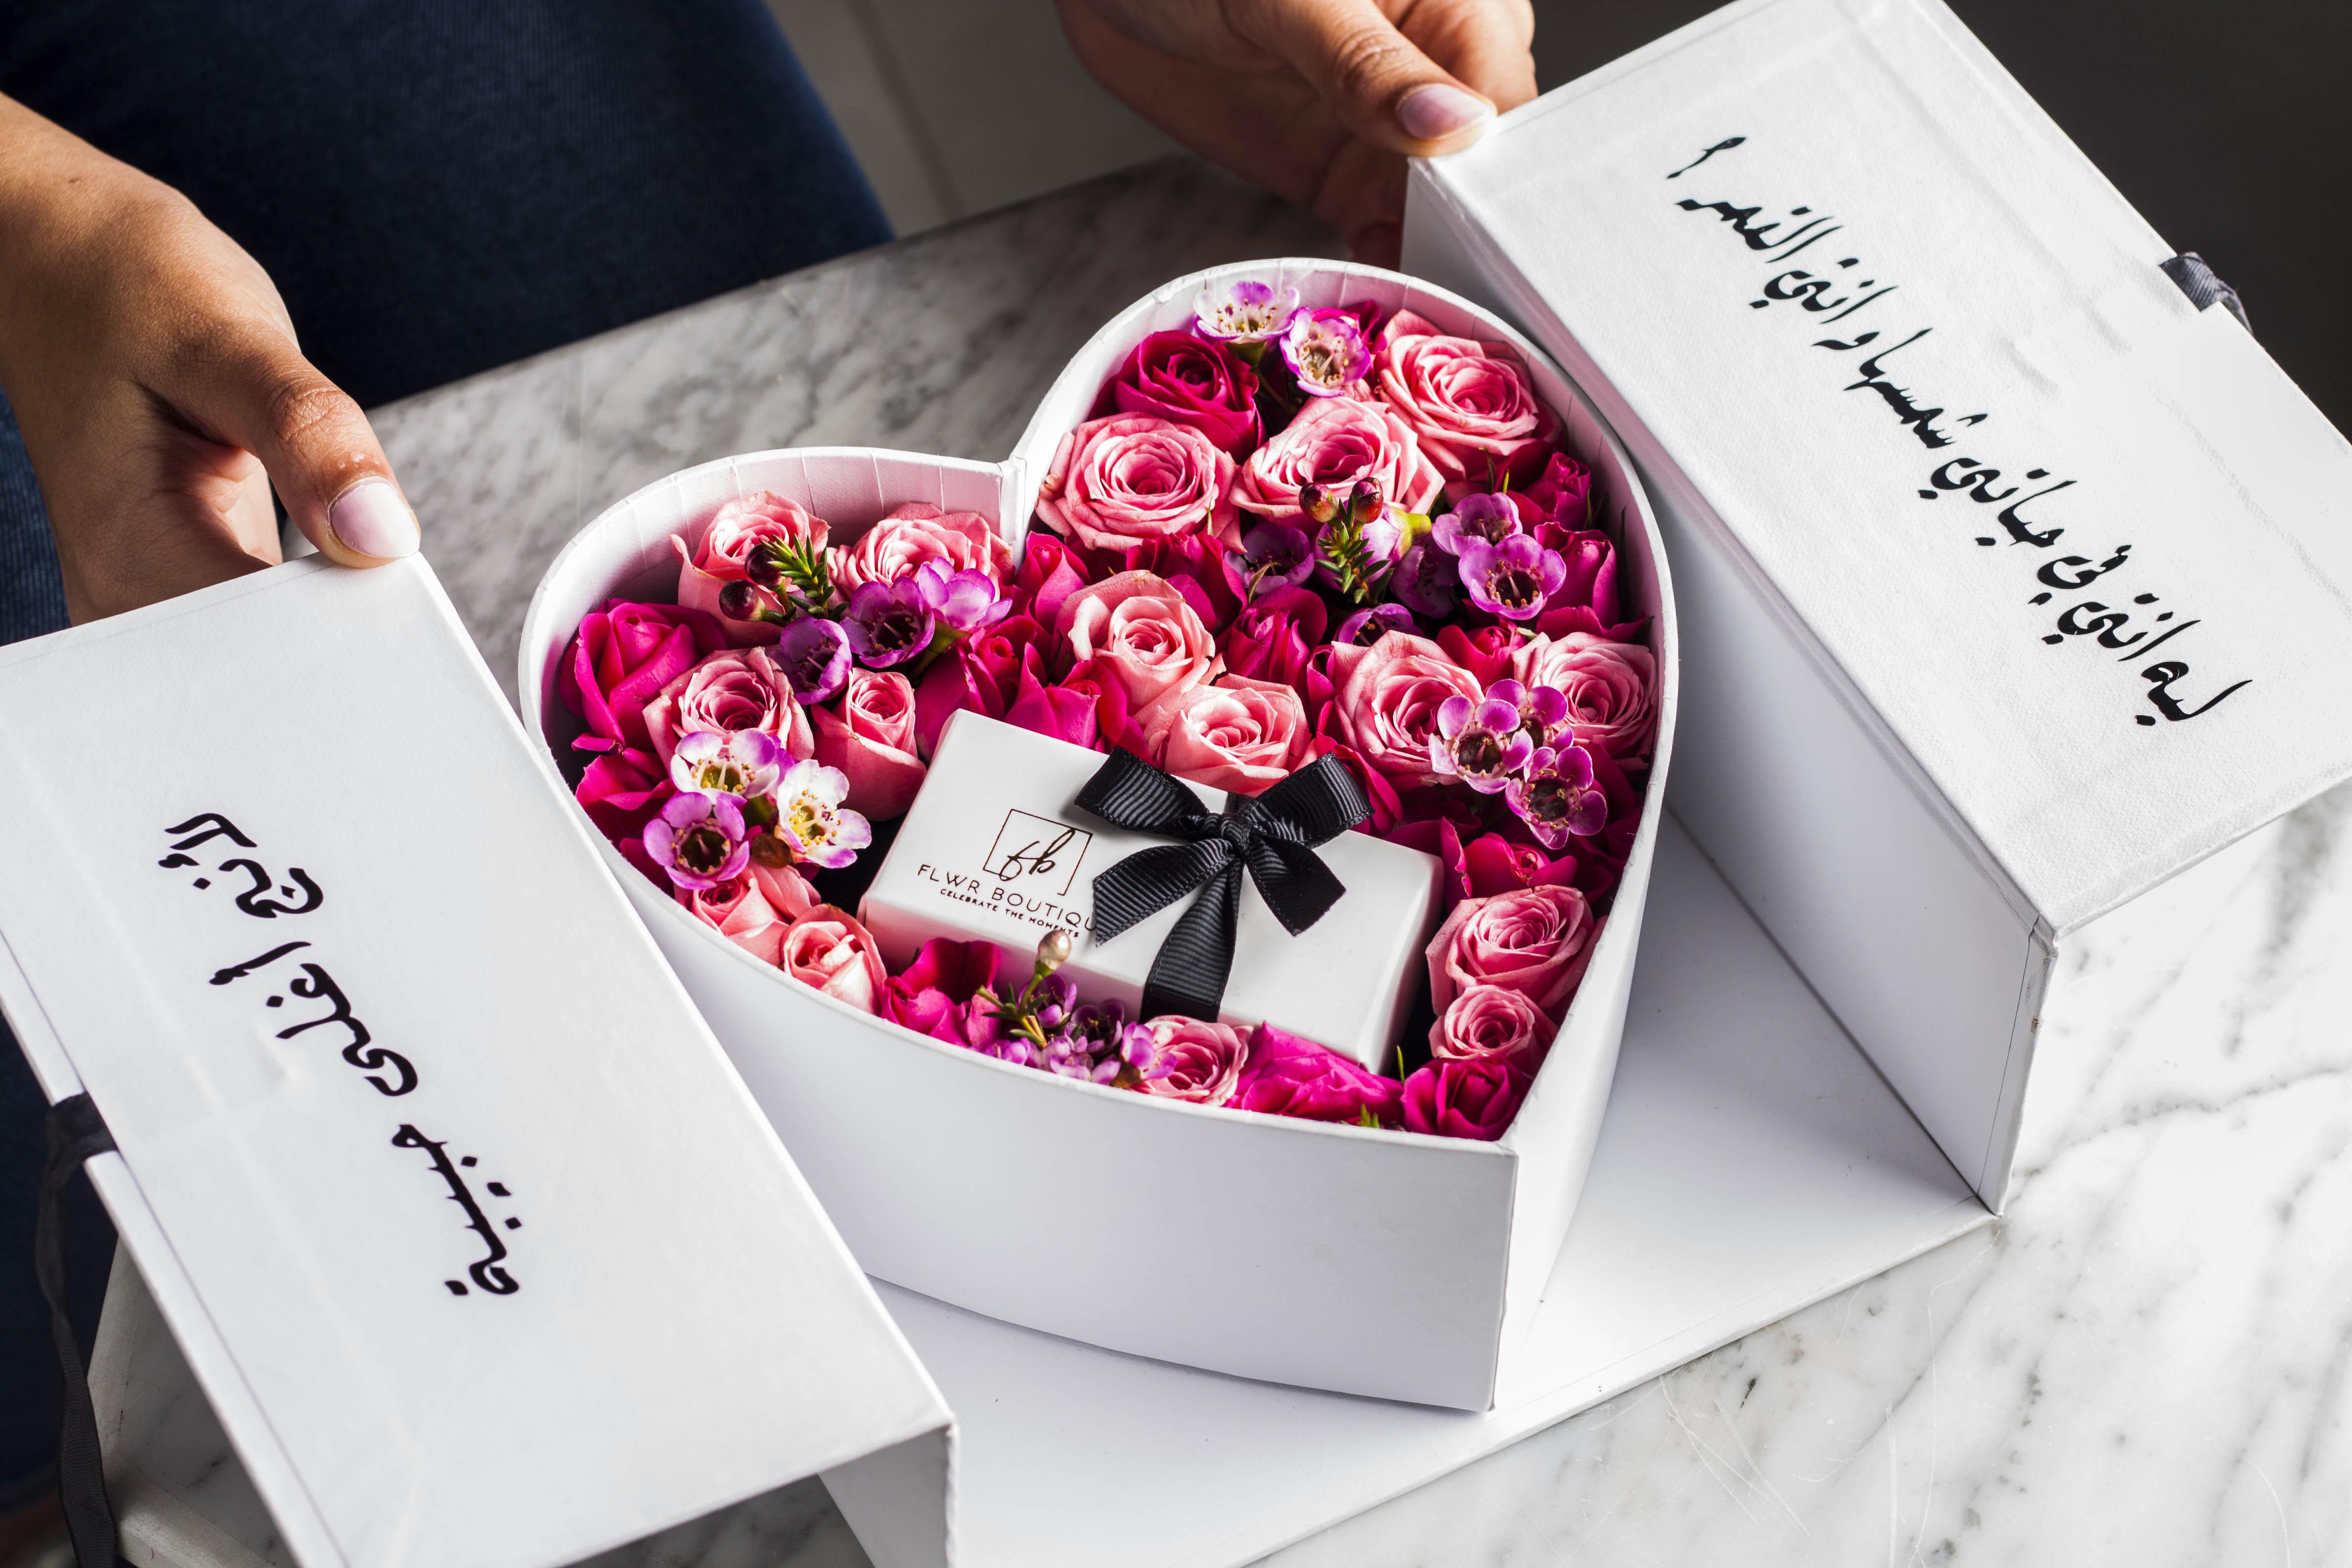 Aghla Habiba Box - Chocolate 'الحب الأحمر'